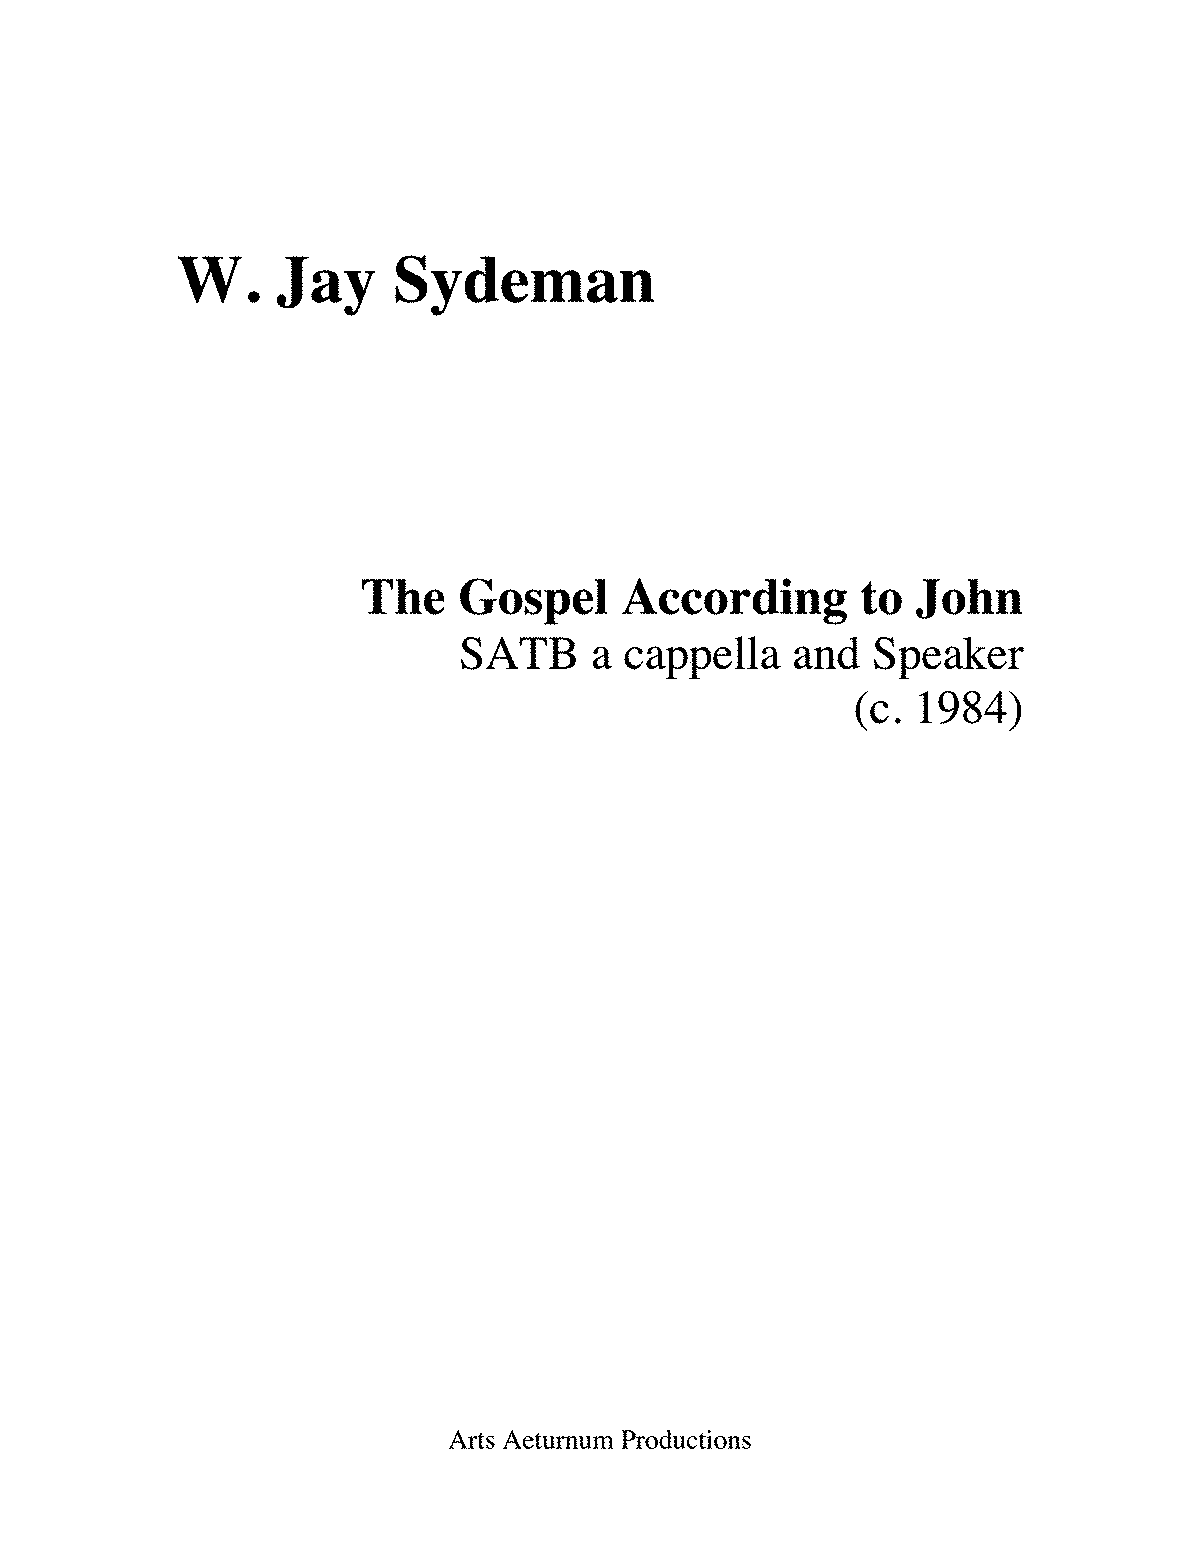 The Gospel According to John (Sydeman, William Jay) - IMSLP